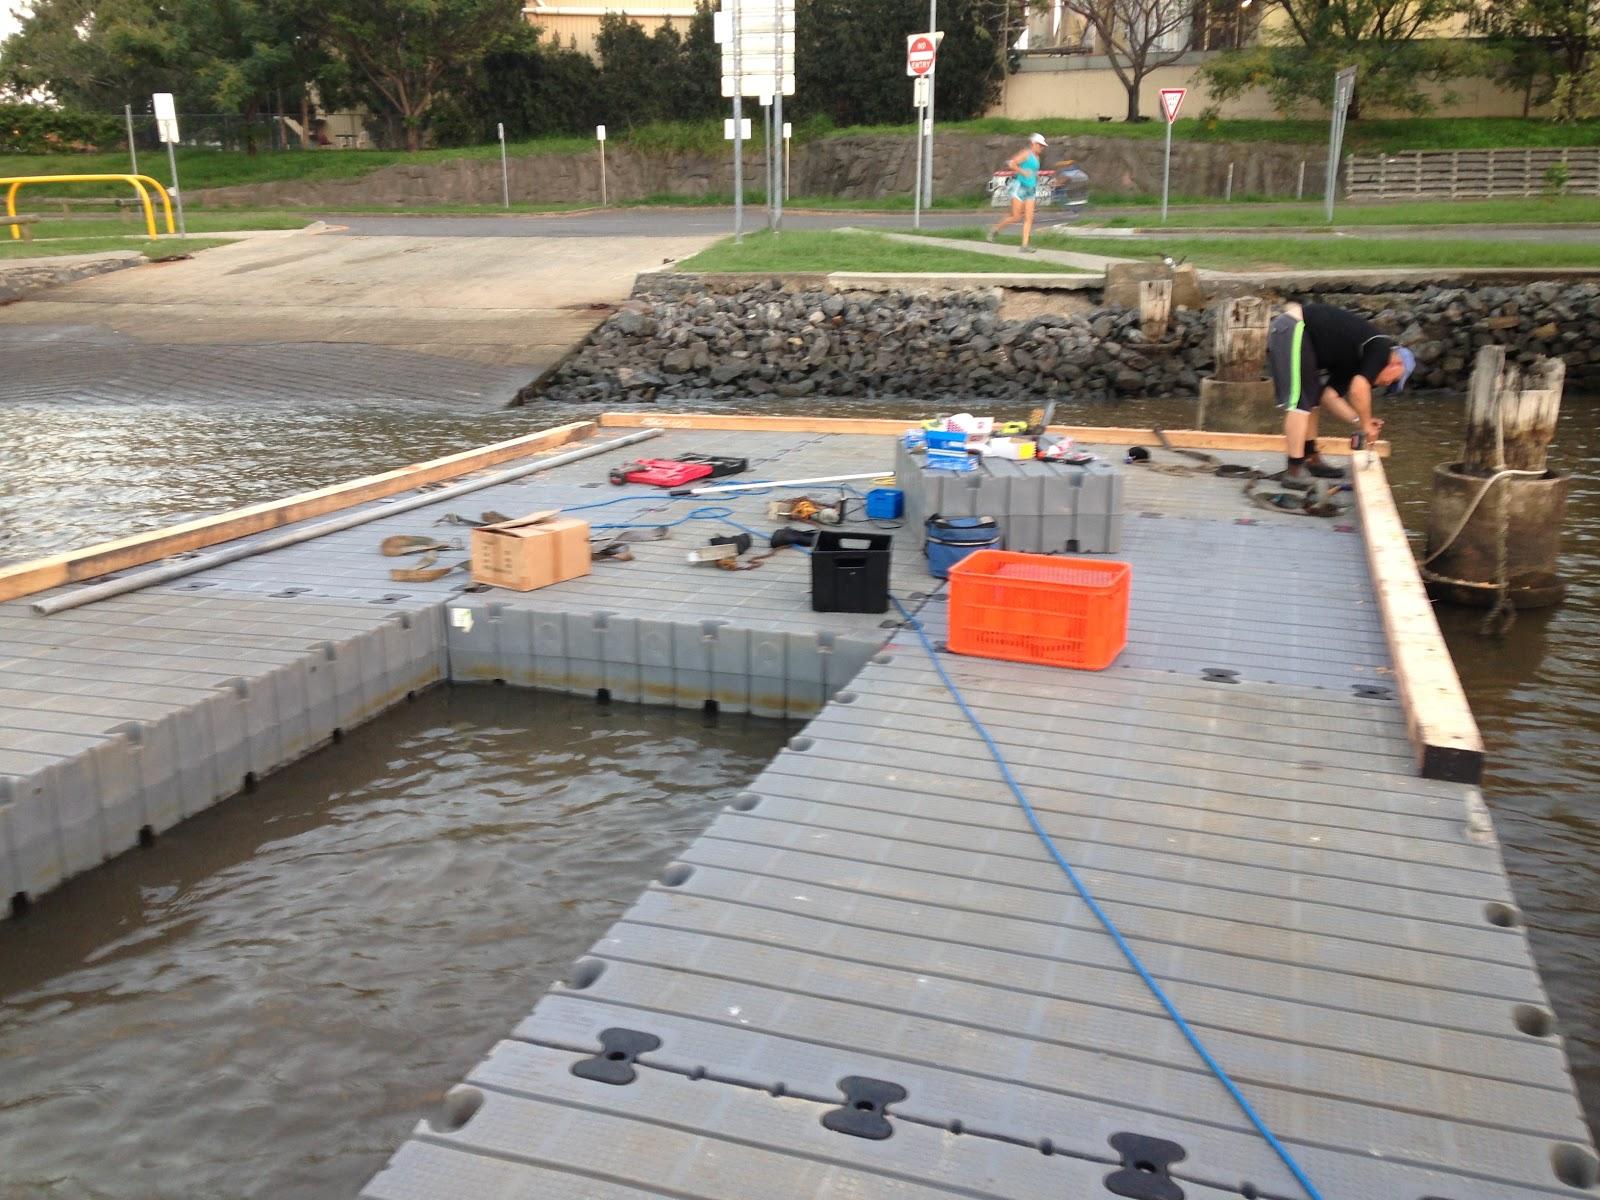 modular dumb barge, work platform, road trasnportable platform, floats, modular floats, floating platform hire, work platform hire, floating work platform hire